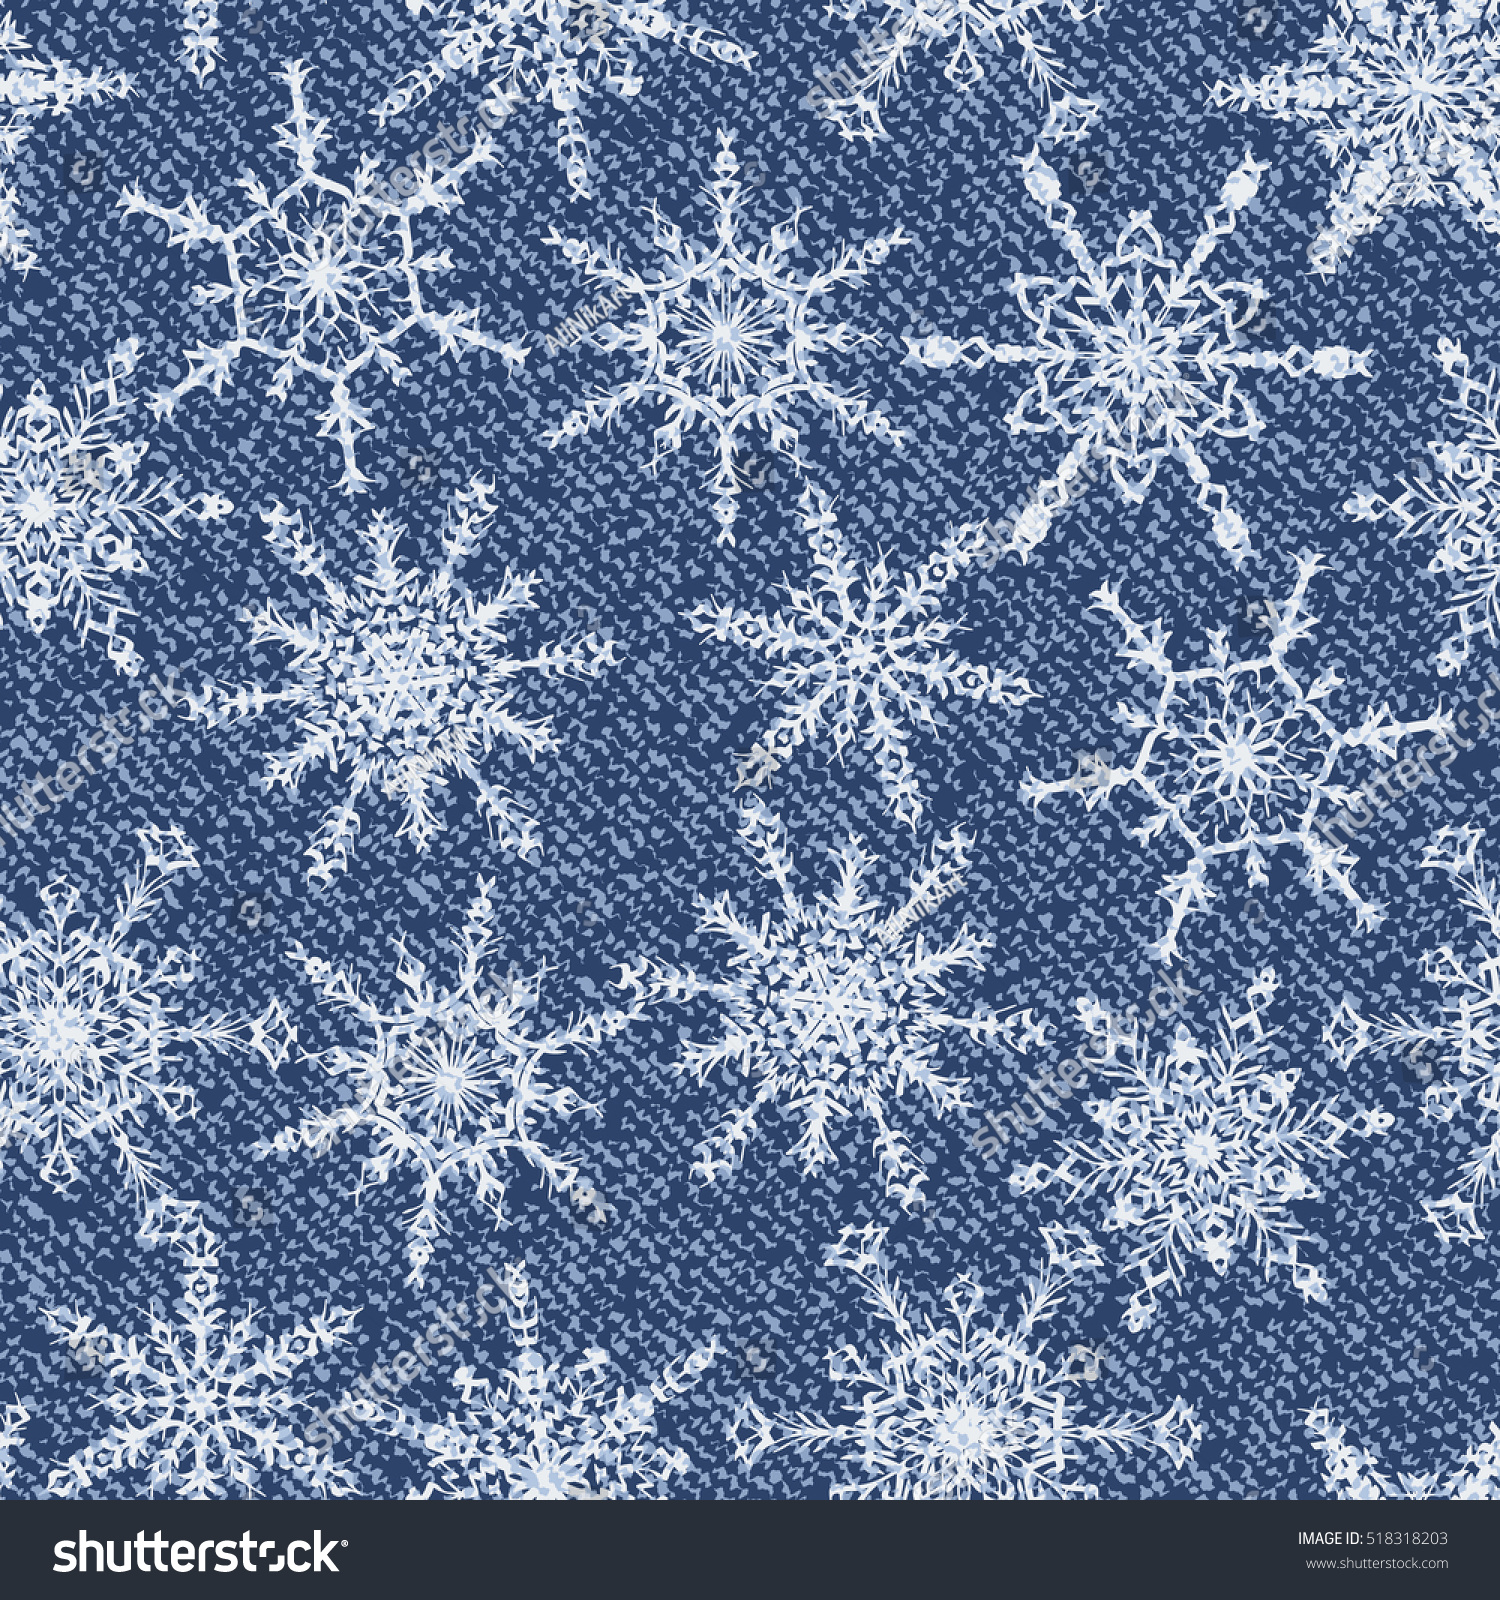 snow holiday wallpaper christmas new year stock vector (royalty free